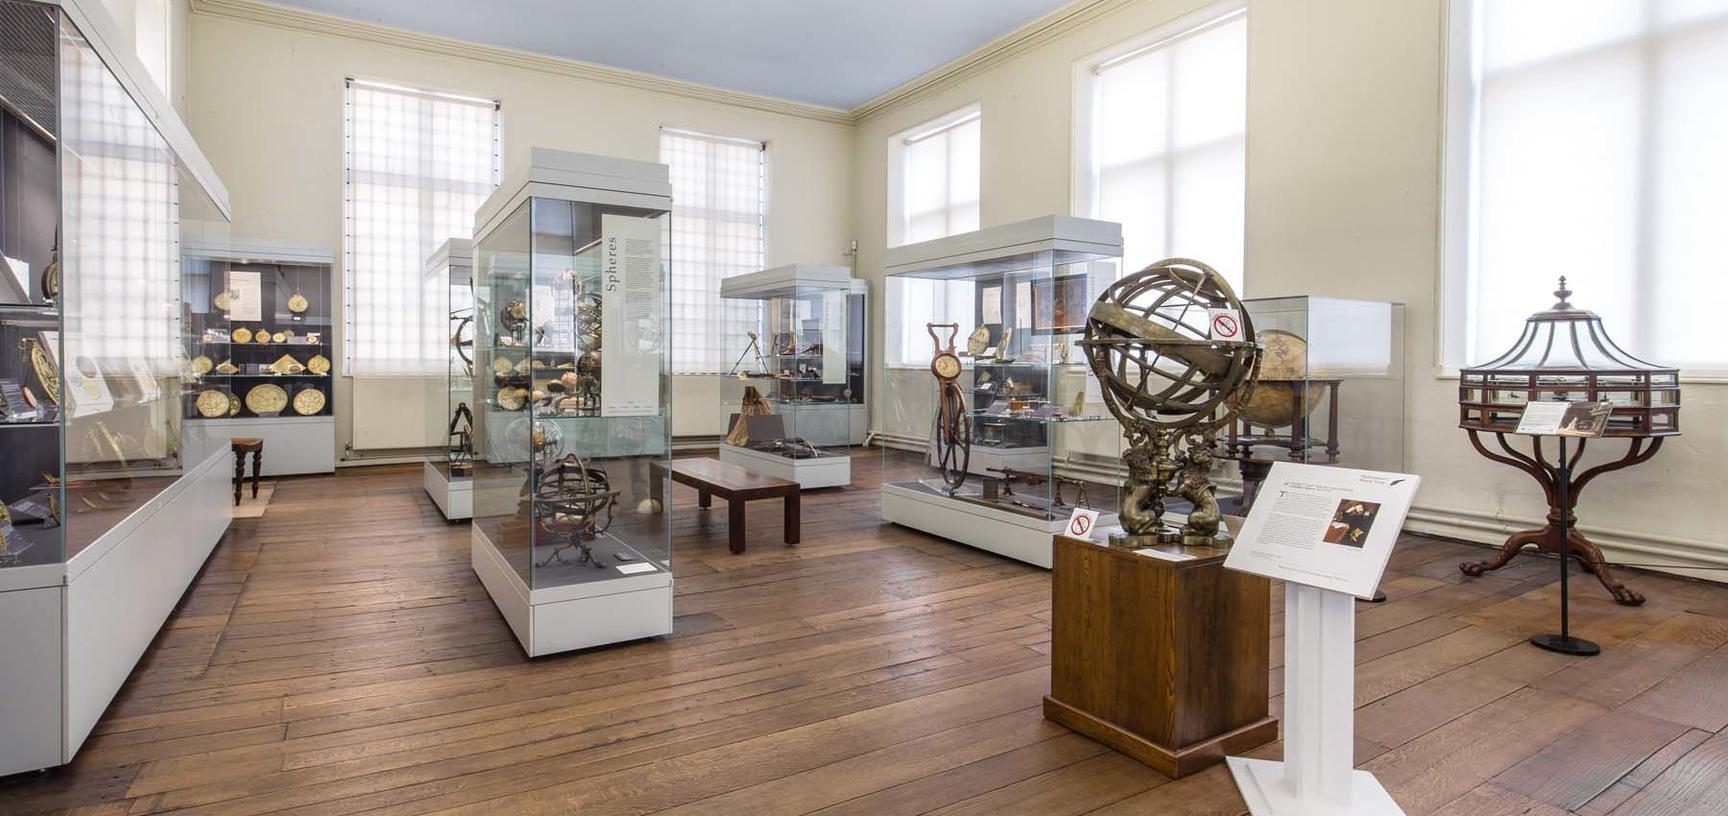 Upper gallery 241